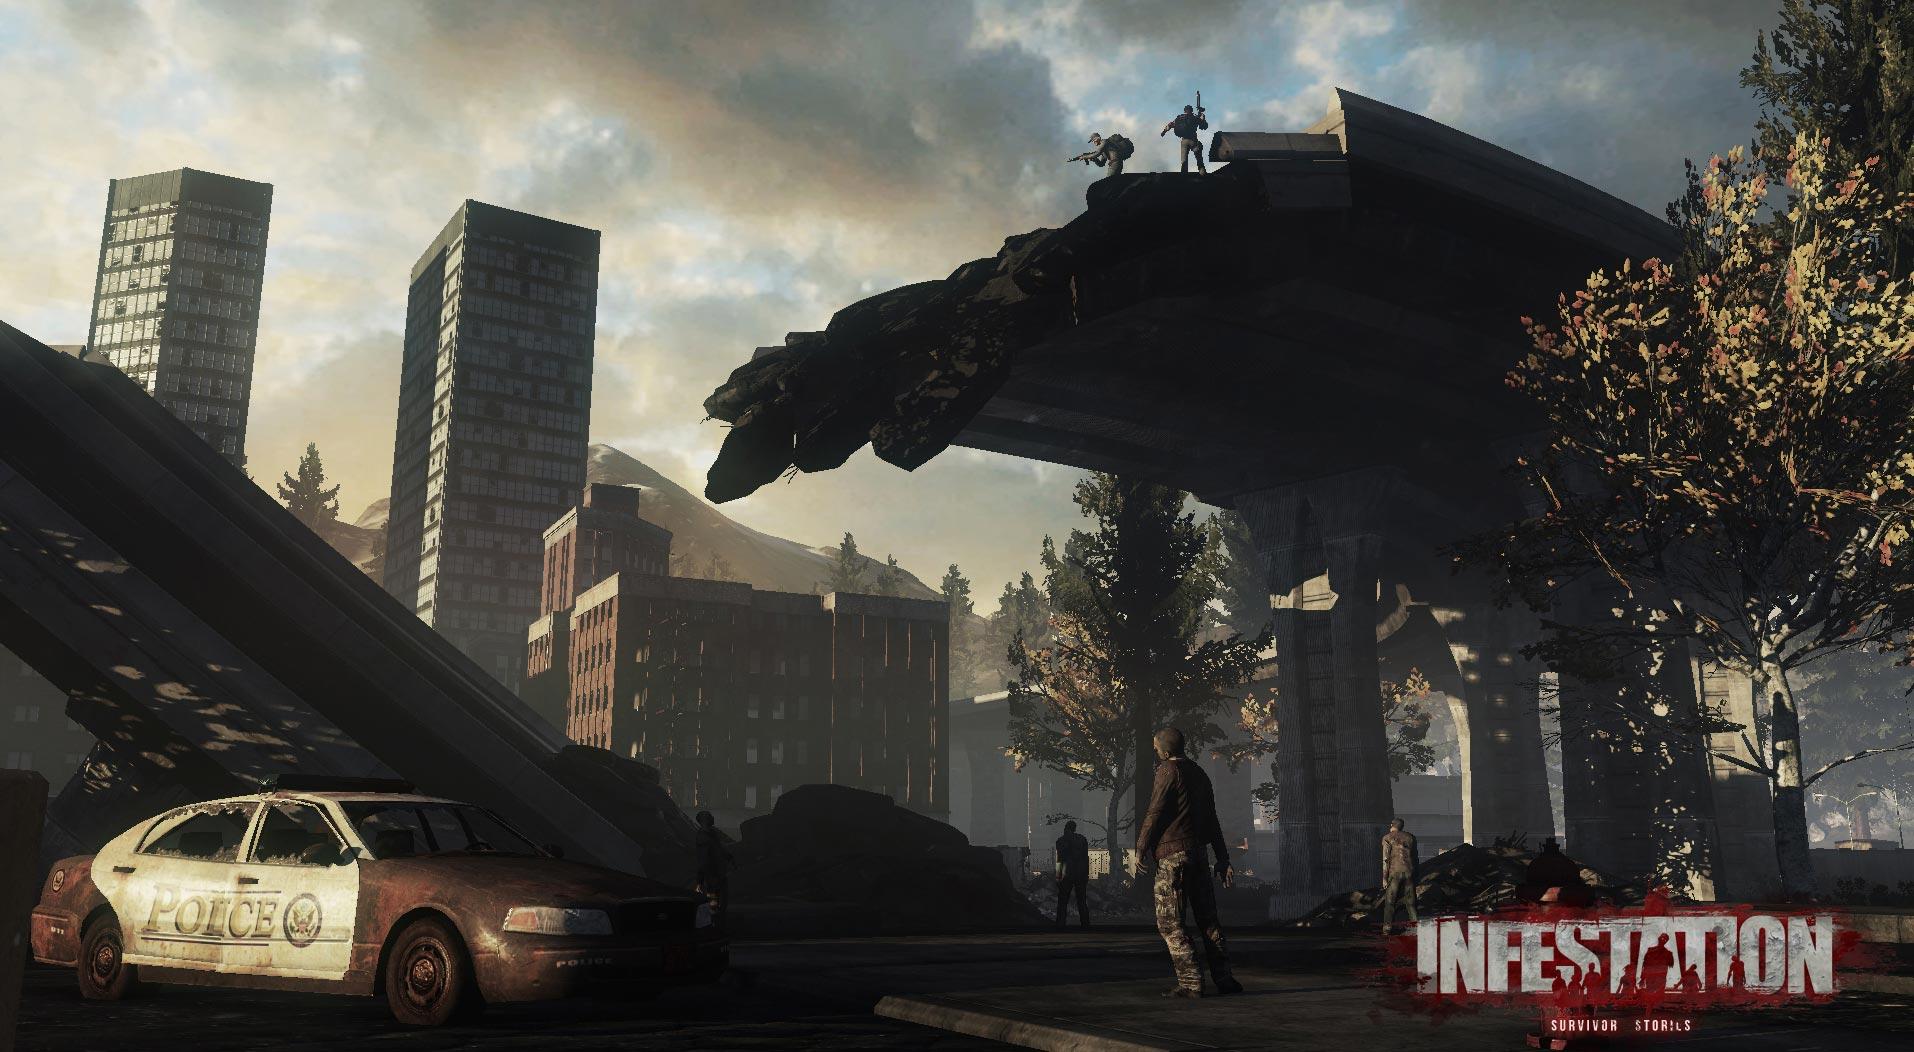 infestation-survivor-stories-city